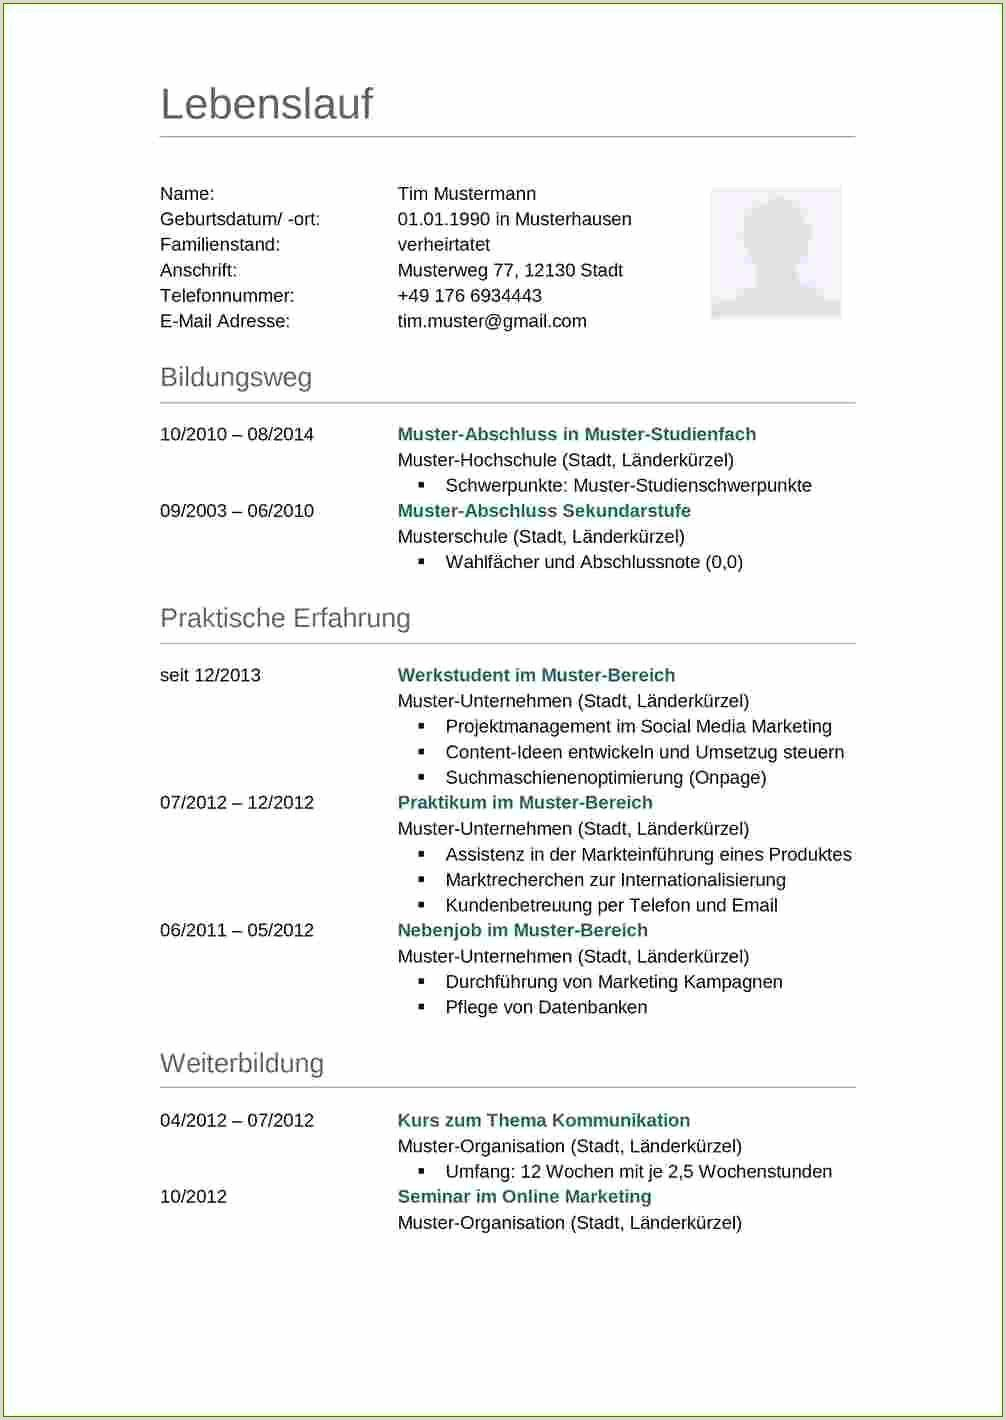 Lebenslauf Luxemburg Muster Lebenslauf Vorlagen Word Vorlagen Lebenslauf Lebenslauf